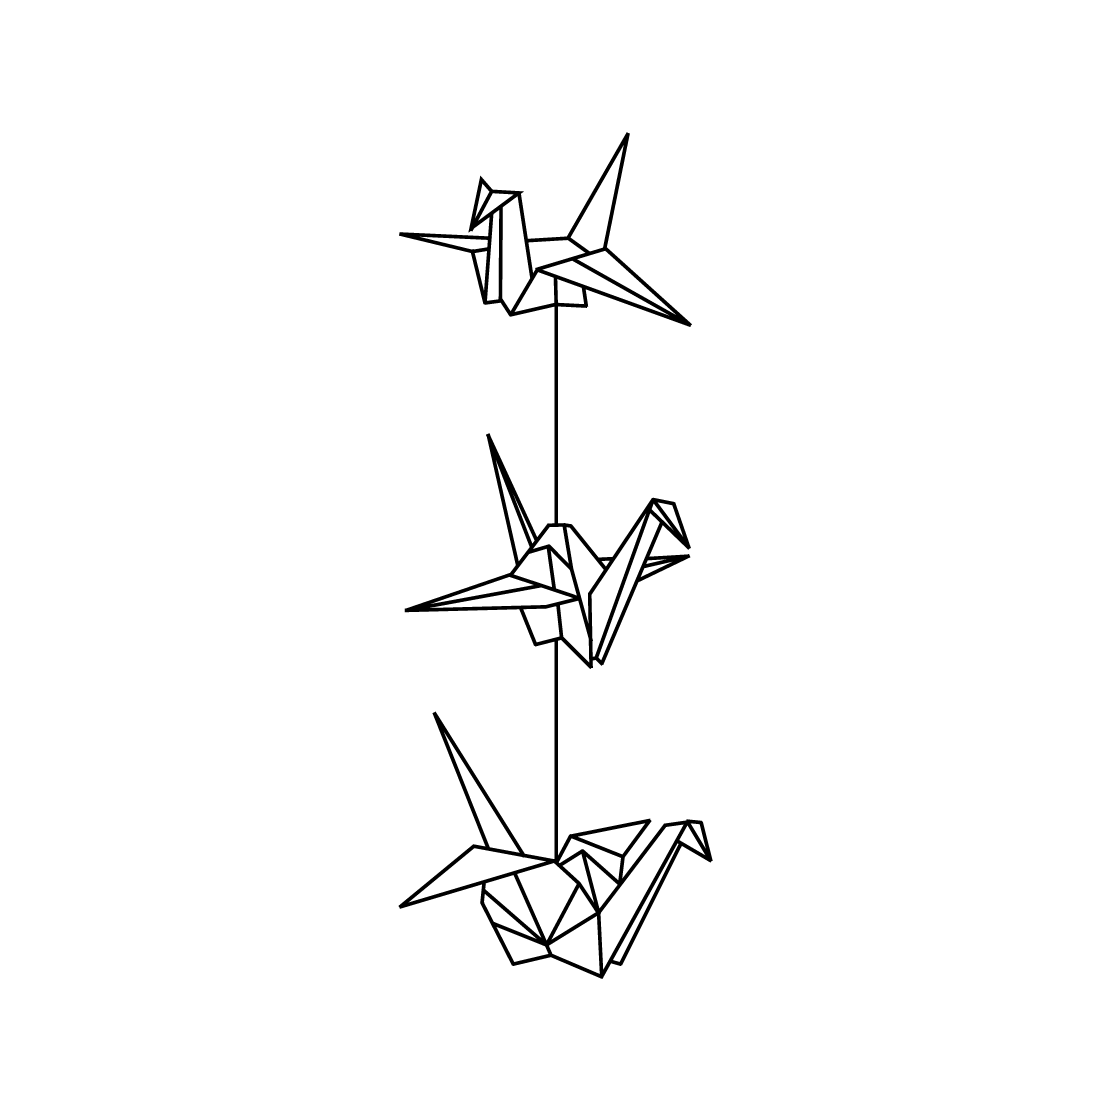 paper crane tattoo - Google Search | Ink | Pinterest ... - photo#10